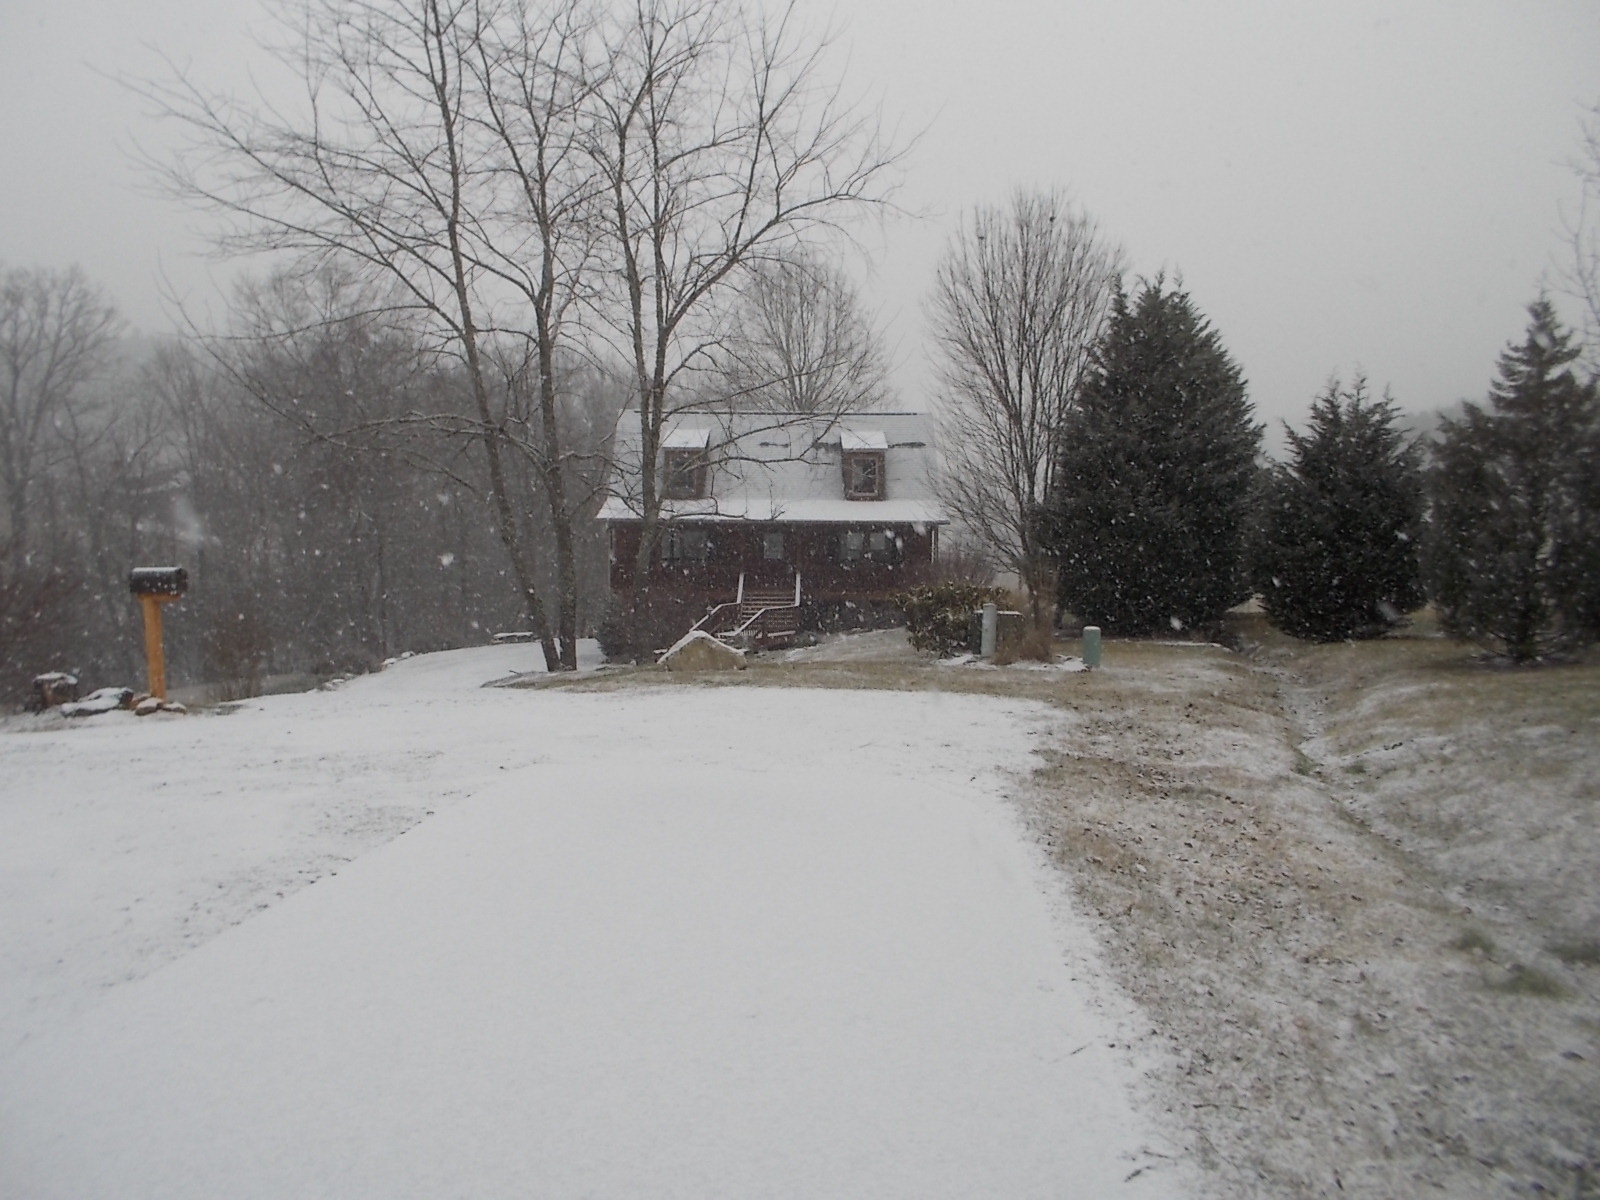 021216 Amy's house in snow.JPG